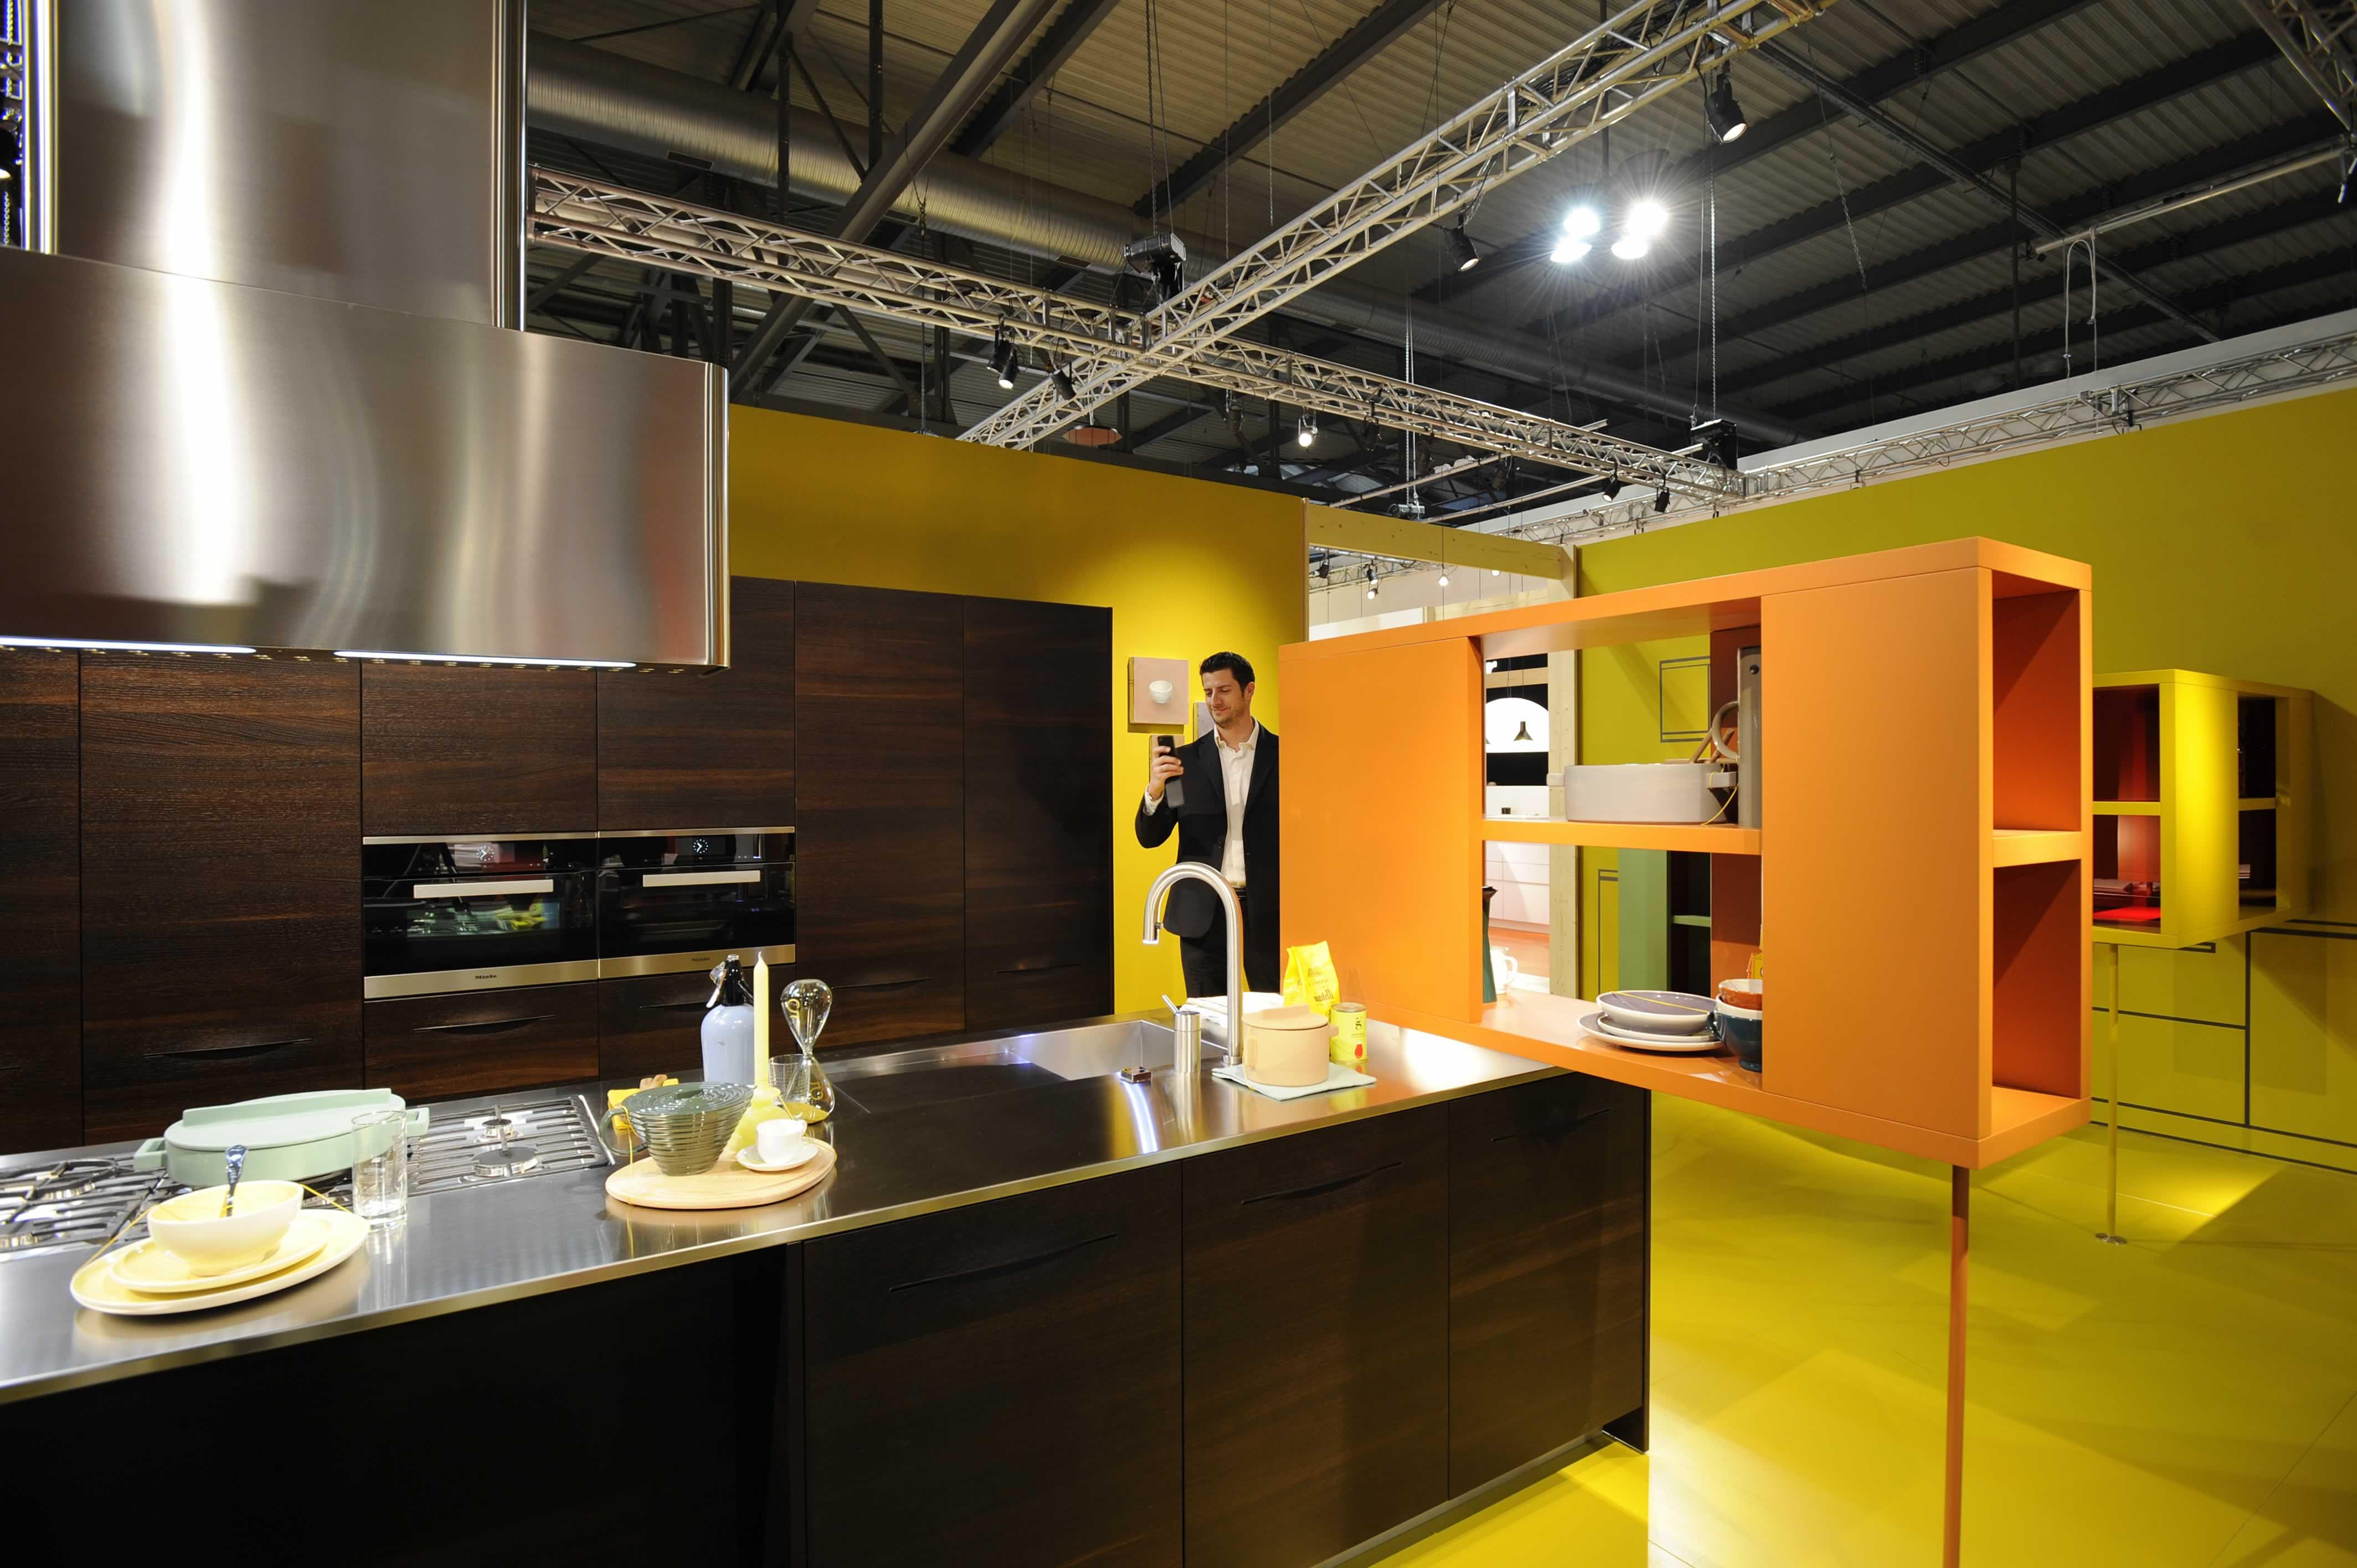 the best kitchen design ideas Eurocucina Visit EuroCucina 2016 for the best kitchen design ideas eurocucina photo by cm 004 13719471825 o